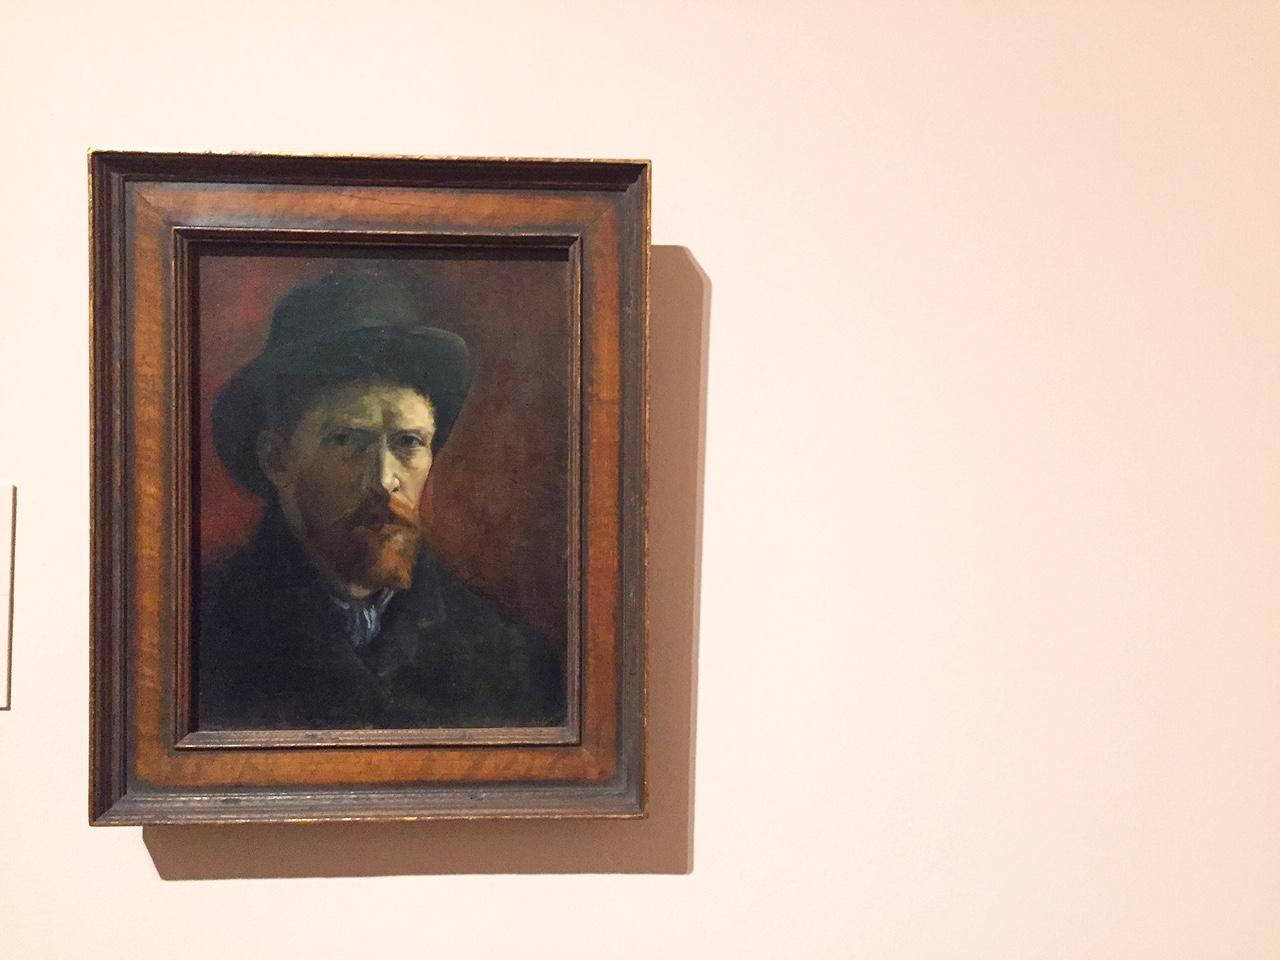 Van Gogh. Self-portrait with Felt hat. 1886-1887. Van Gogh Museum, Amsterdam.